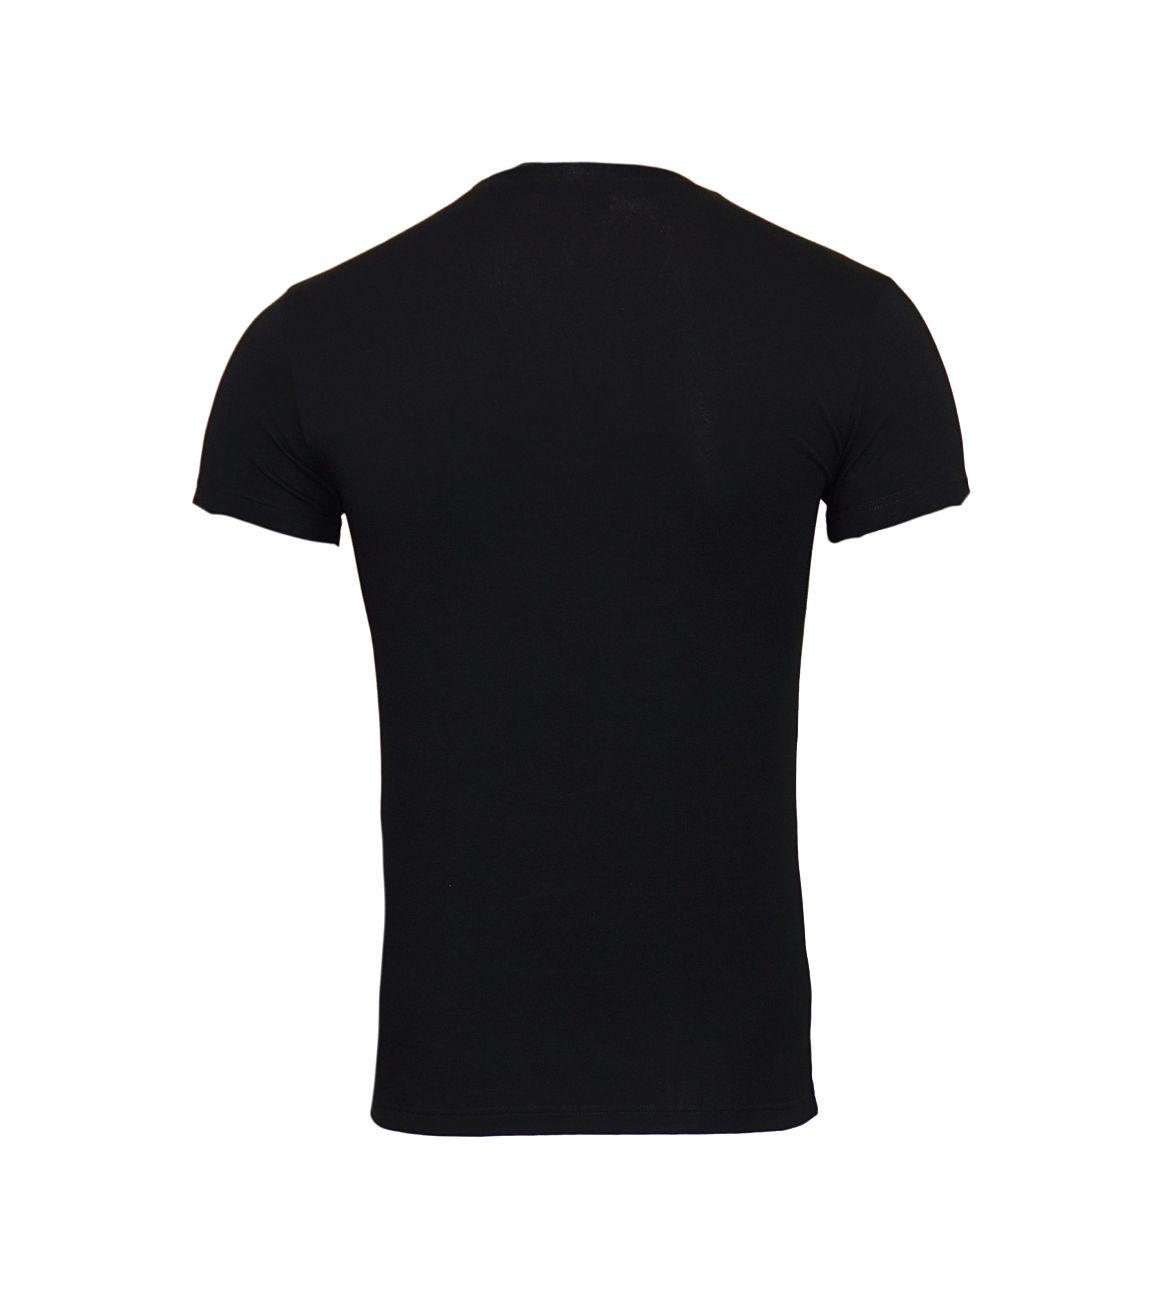 Emporio Armani T-Shirt Rundhals 111035 8P525 00020 NERO F18-EAT1